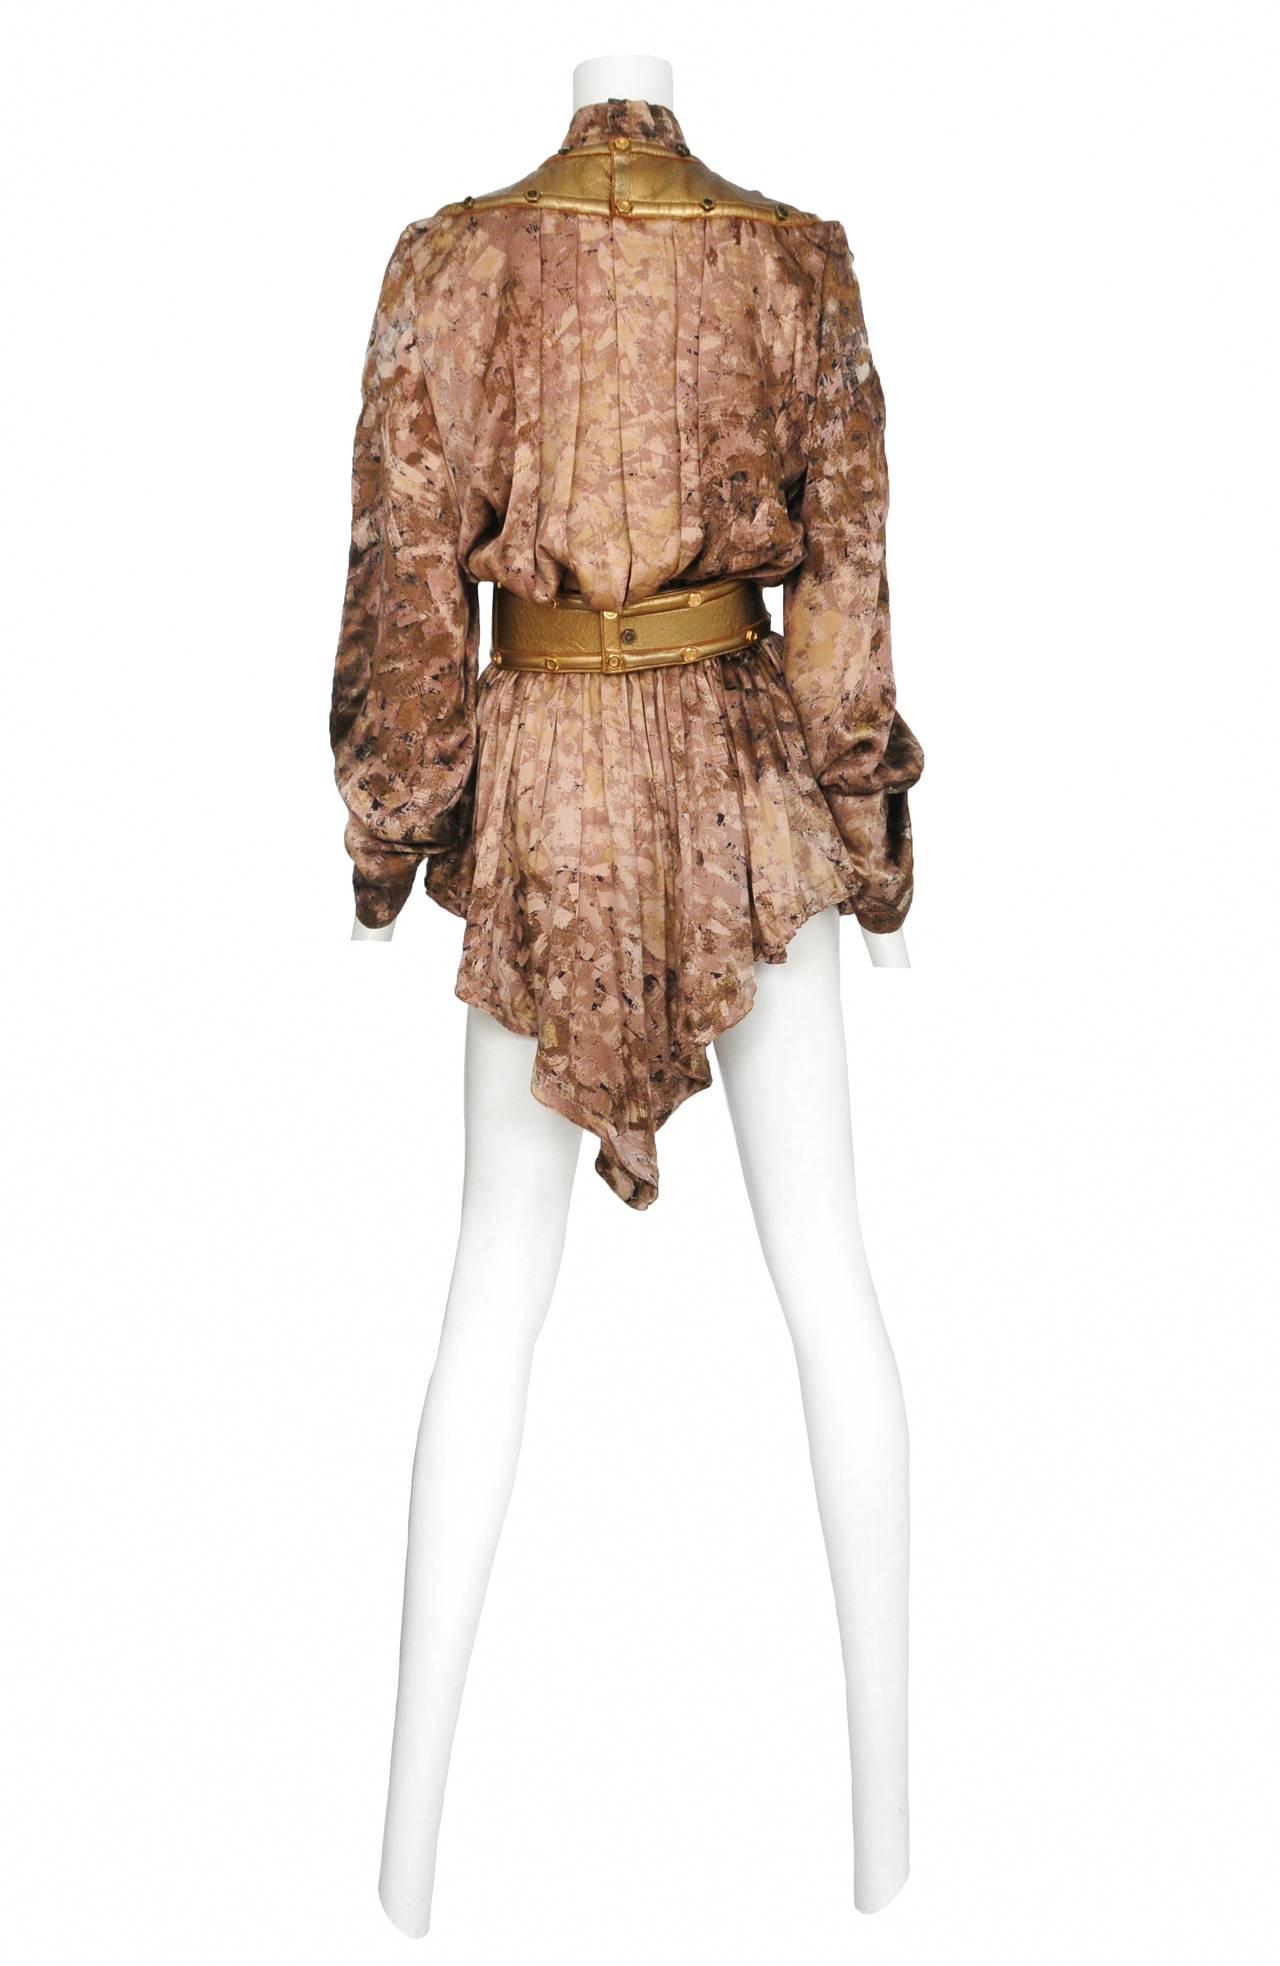 Thierry Mugler Rare Gold Tunic & Leather Belt 2